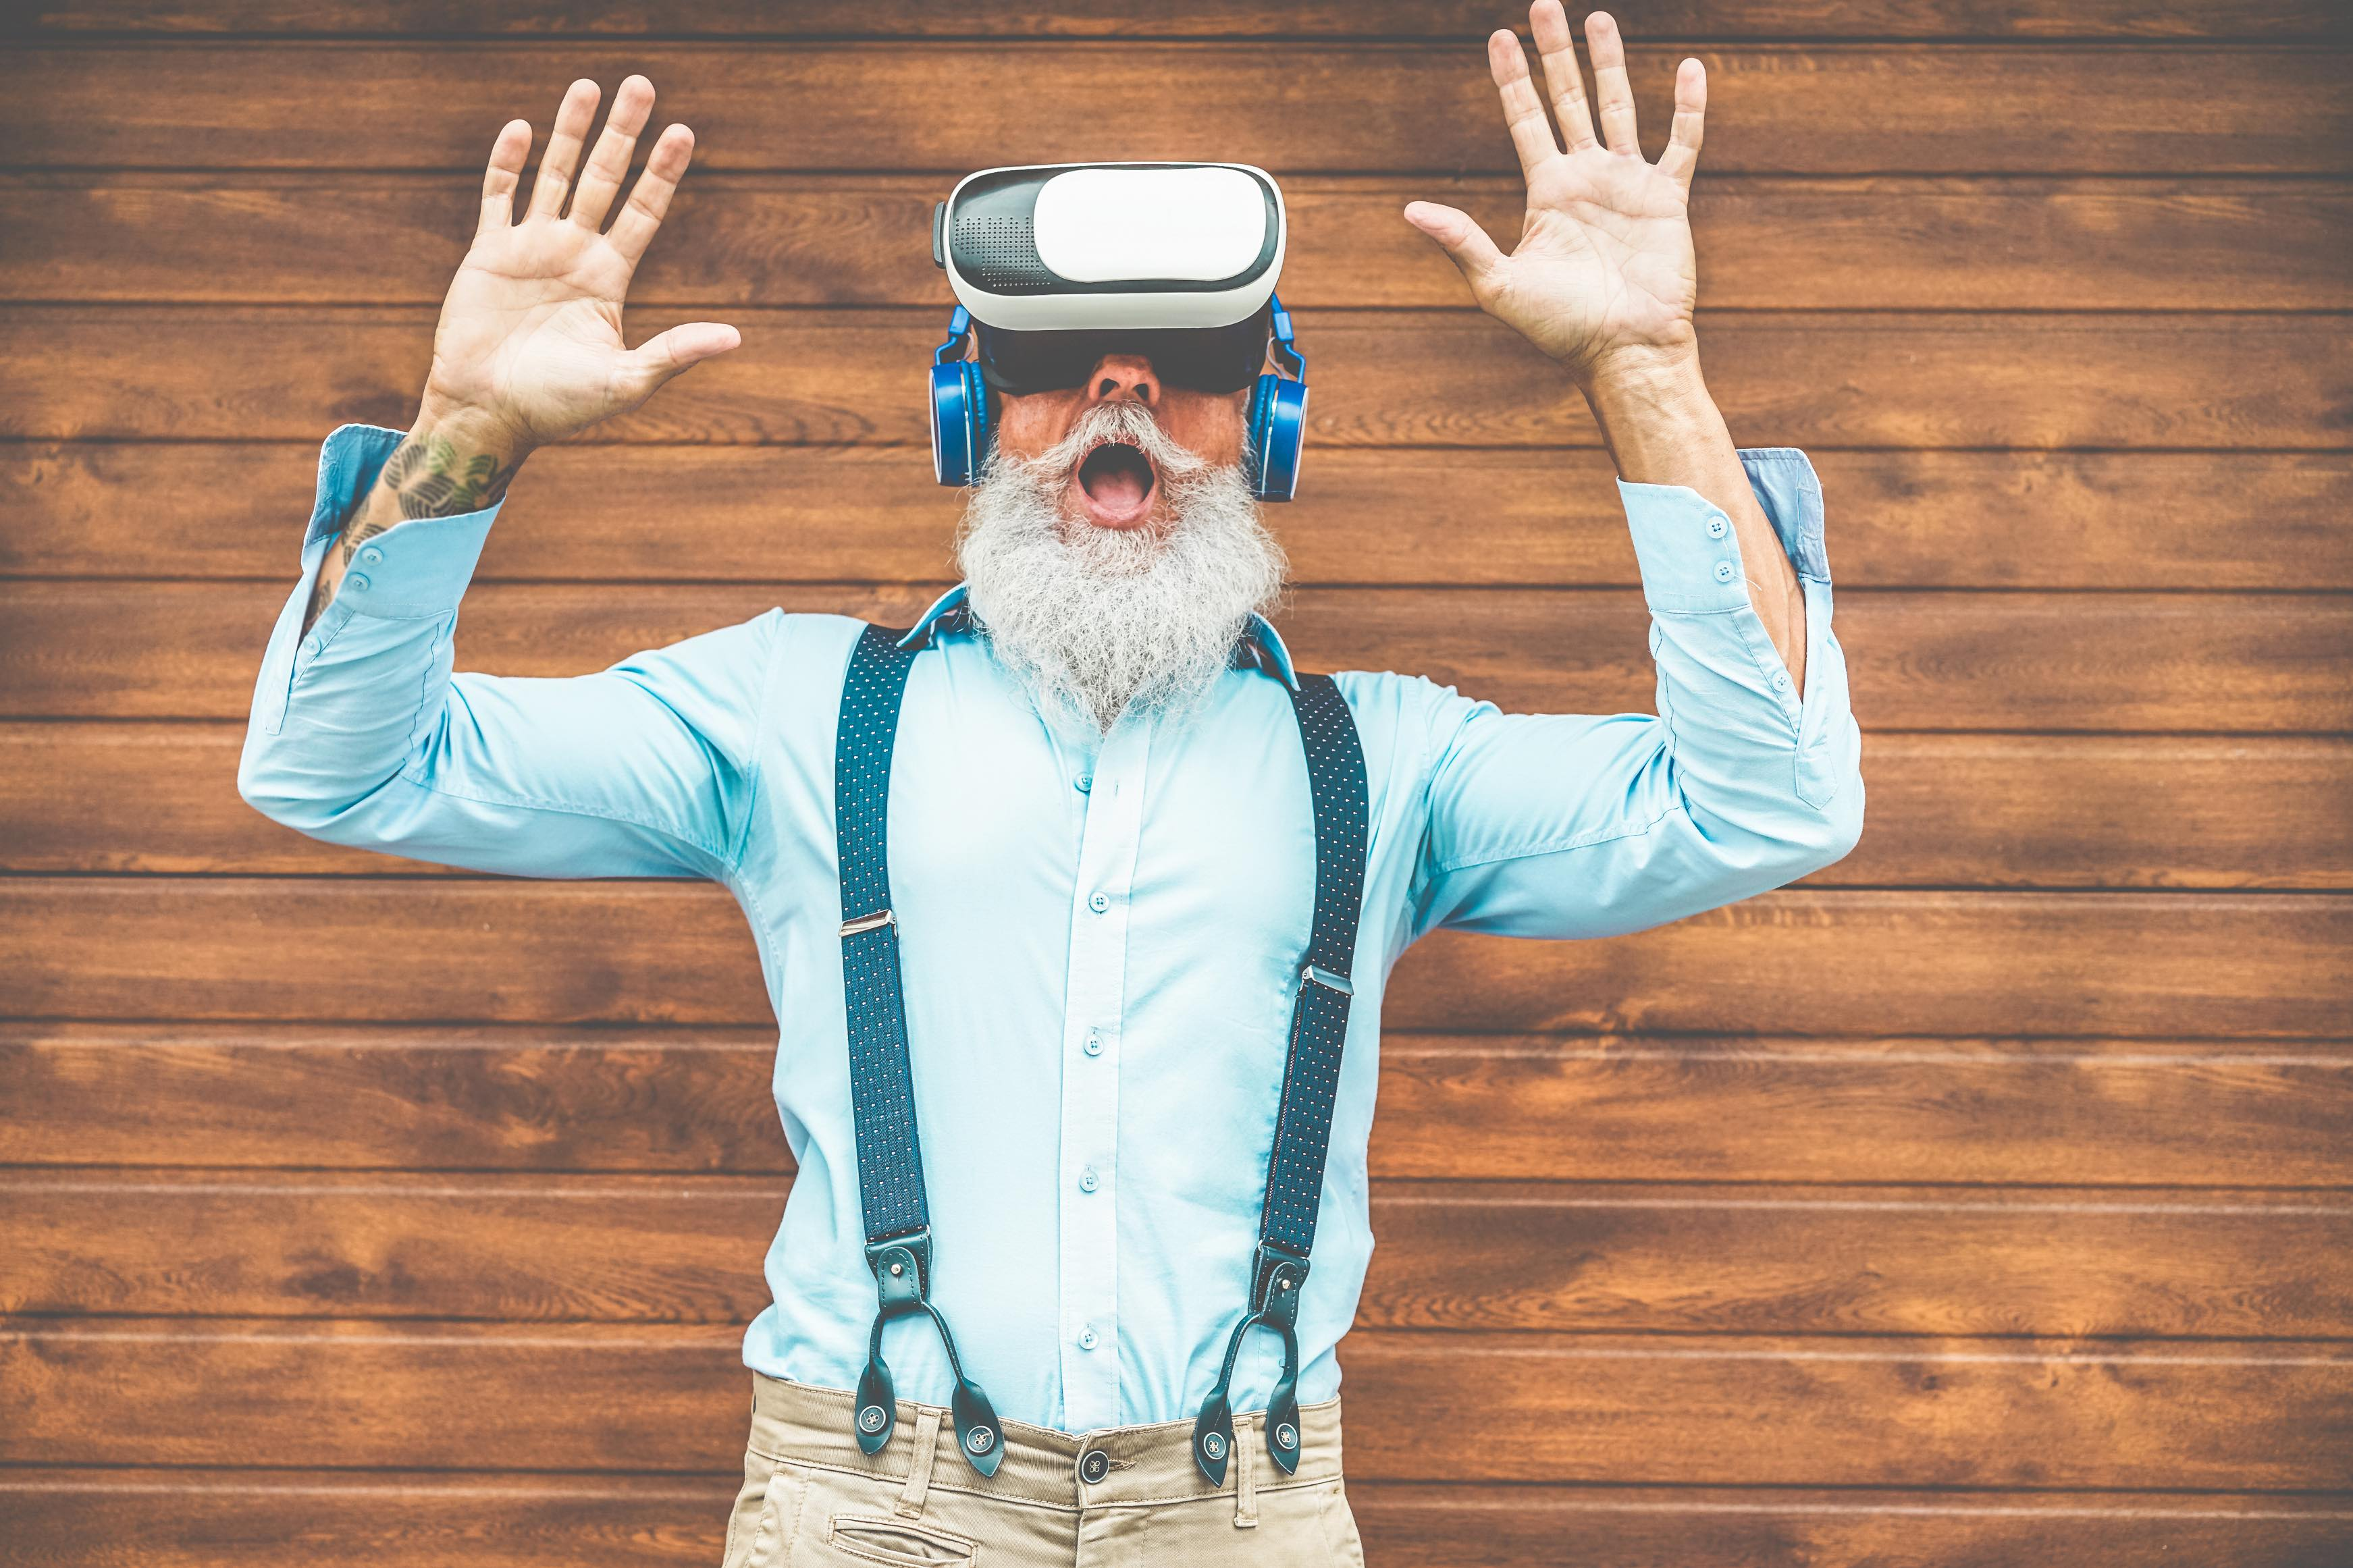 VR-dude